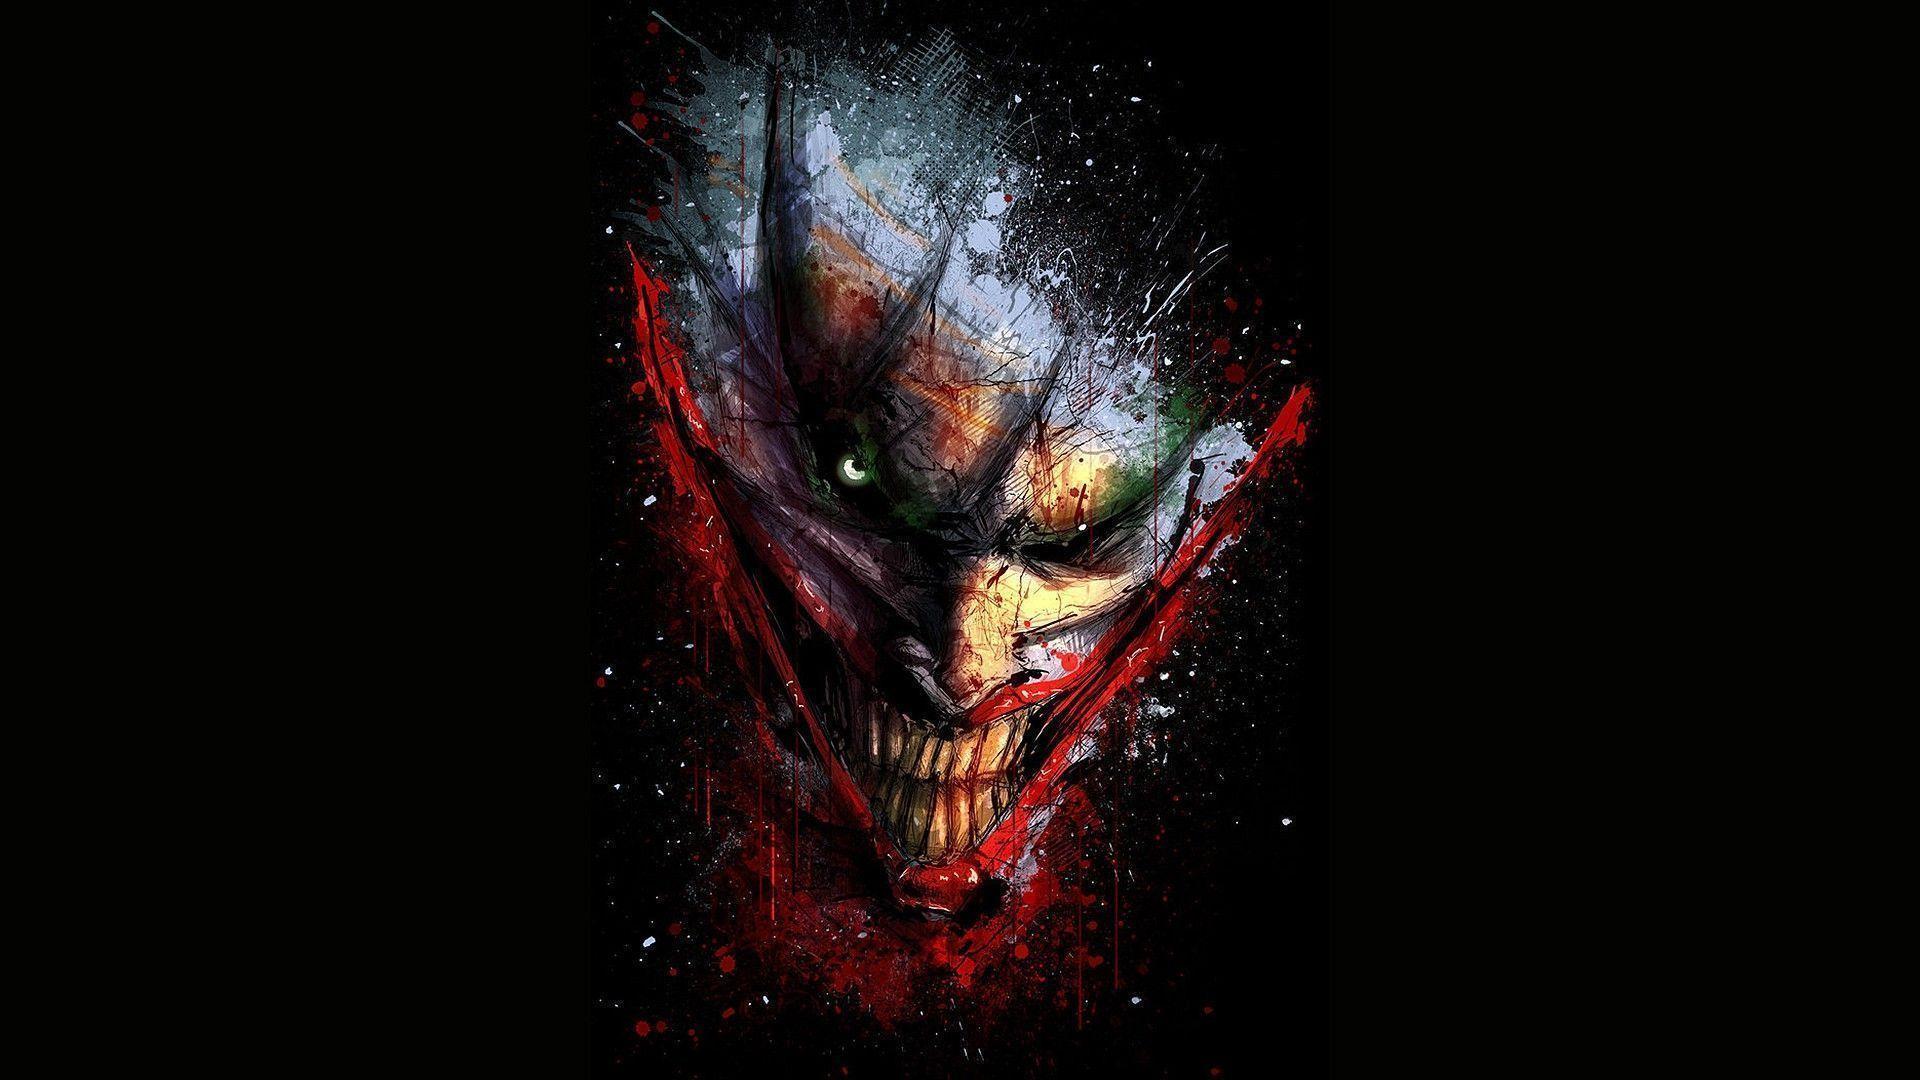 joker wallpaper pc - photo #31